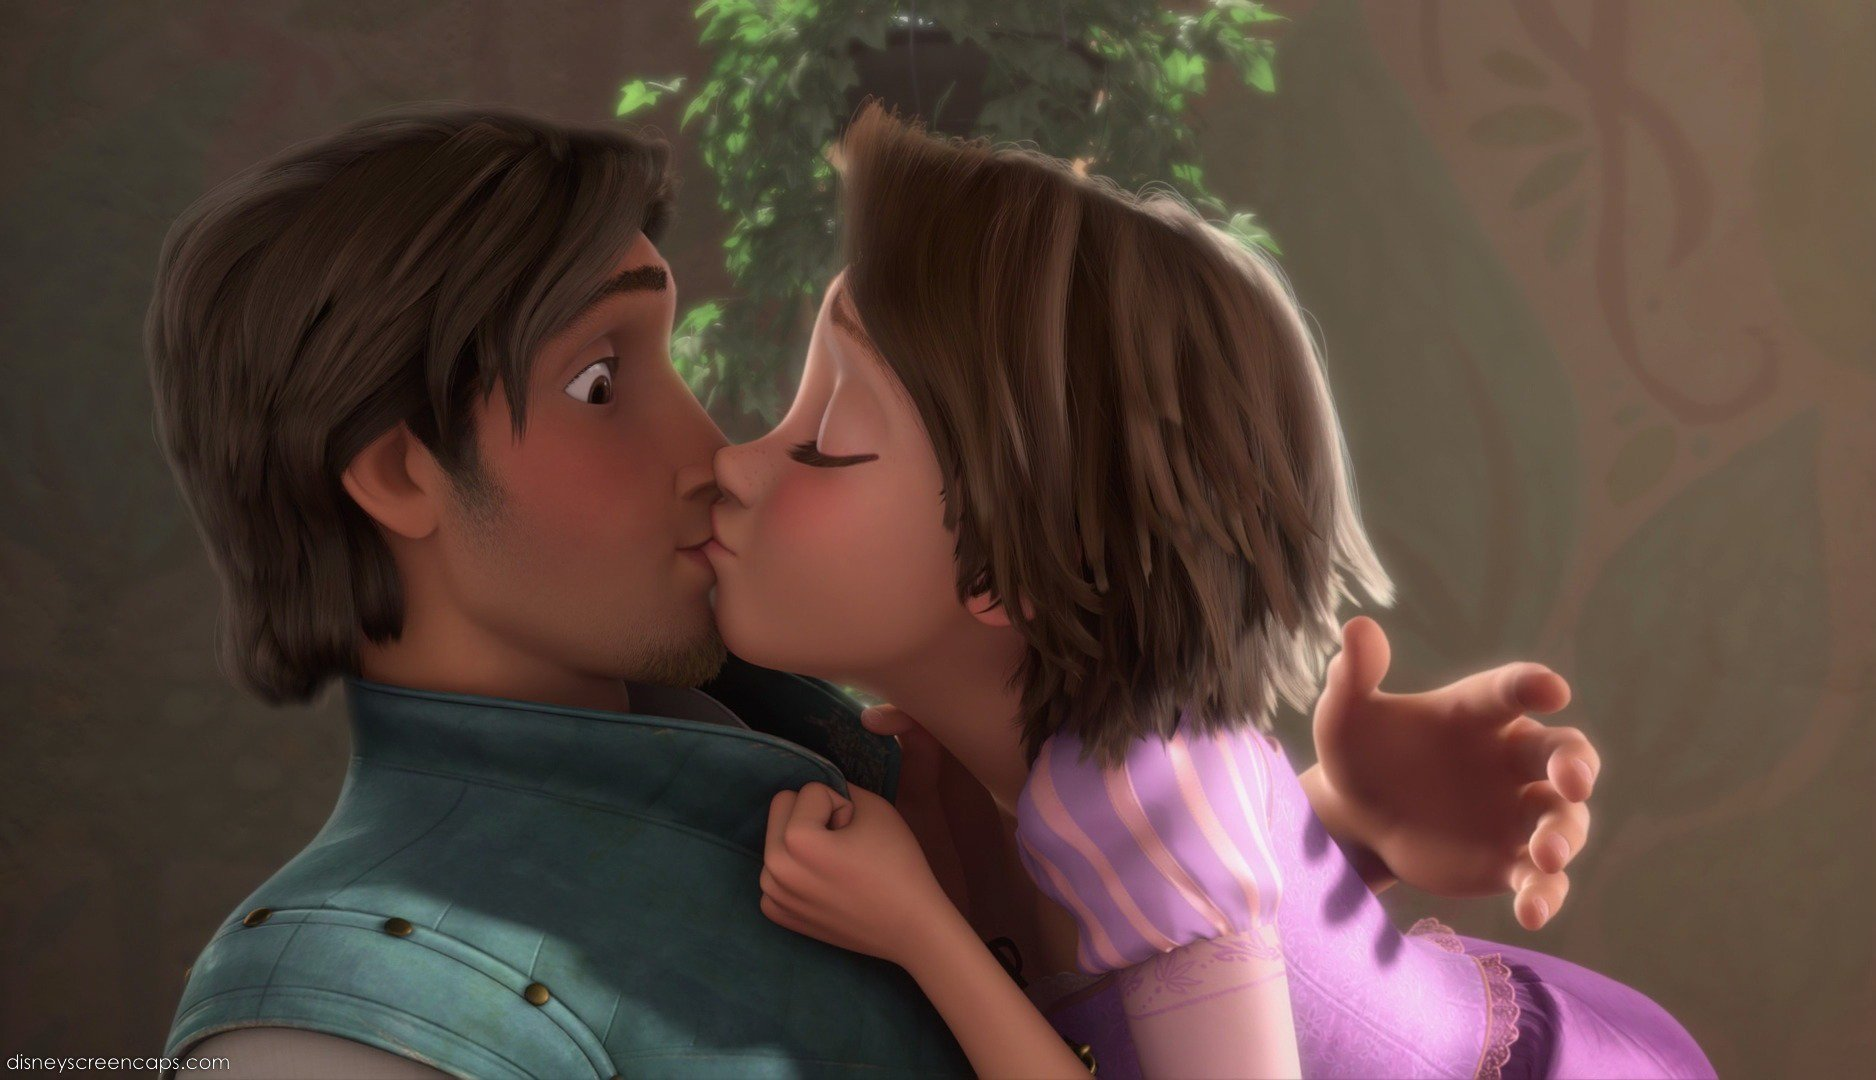 Rapunzel And Flynn Tangled